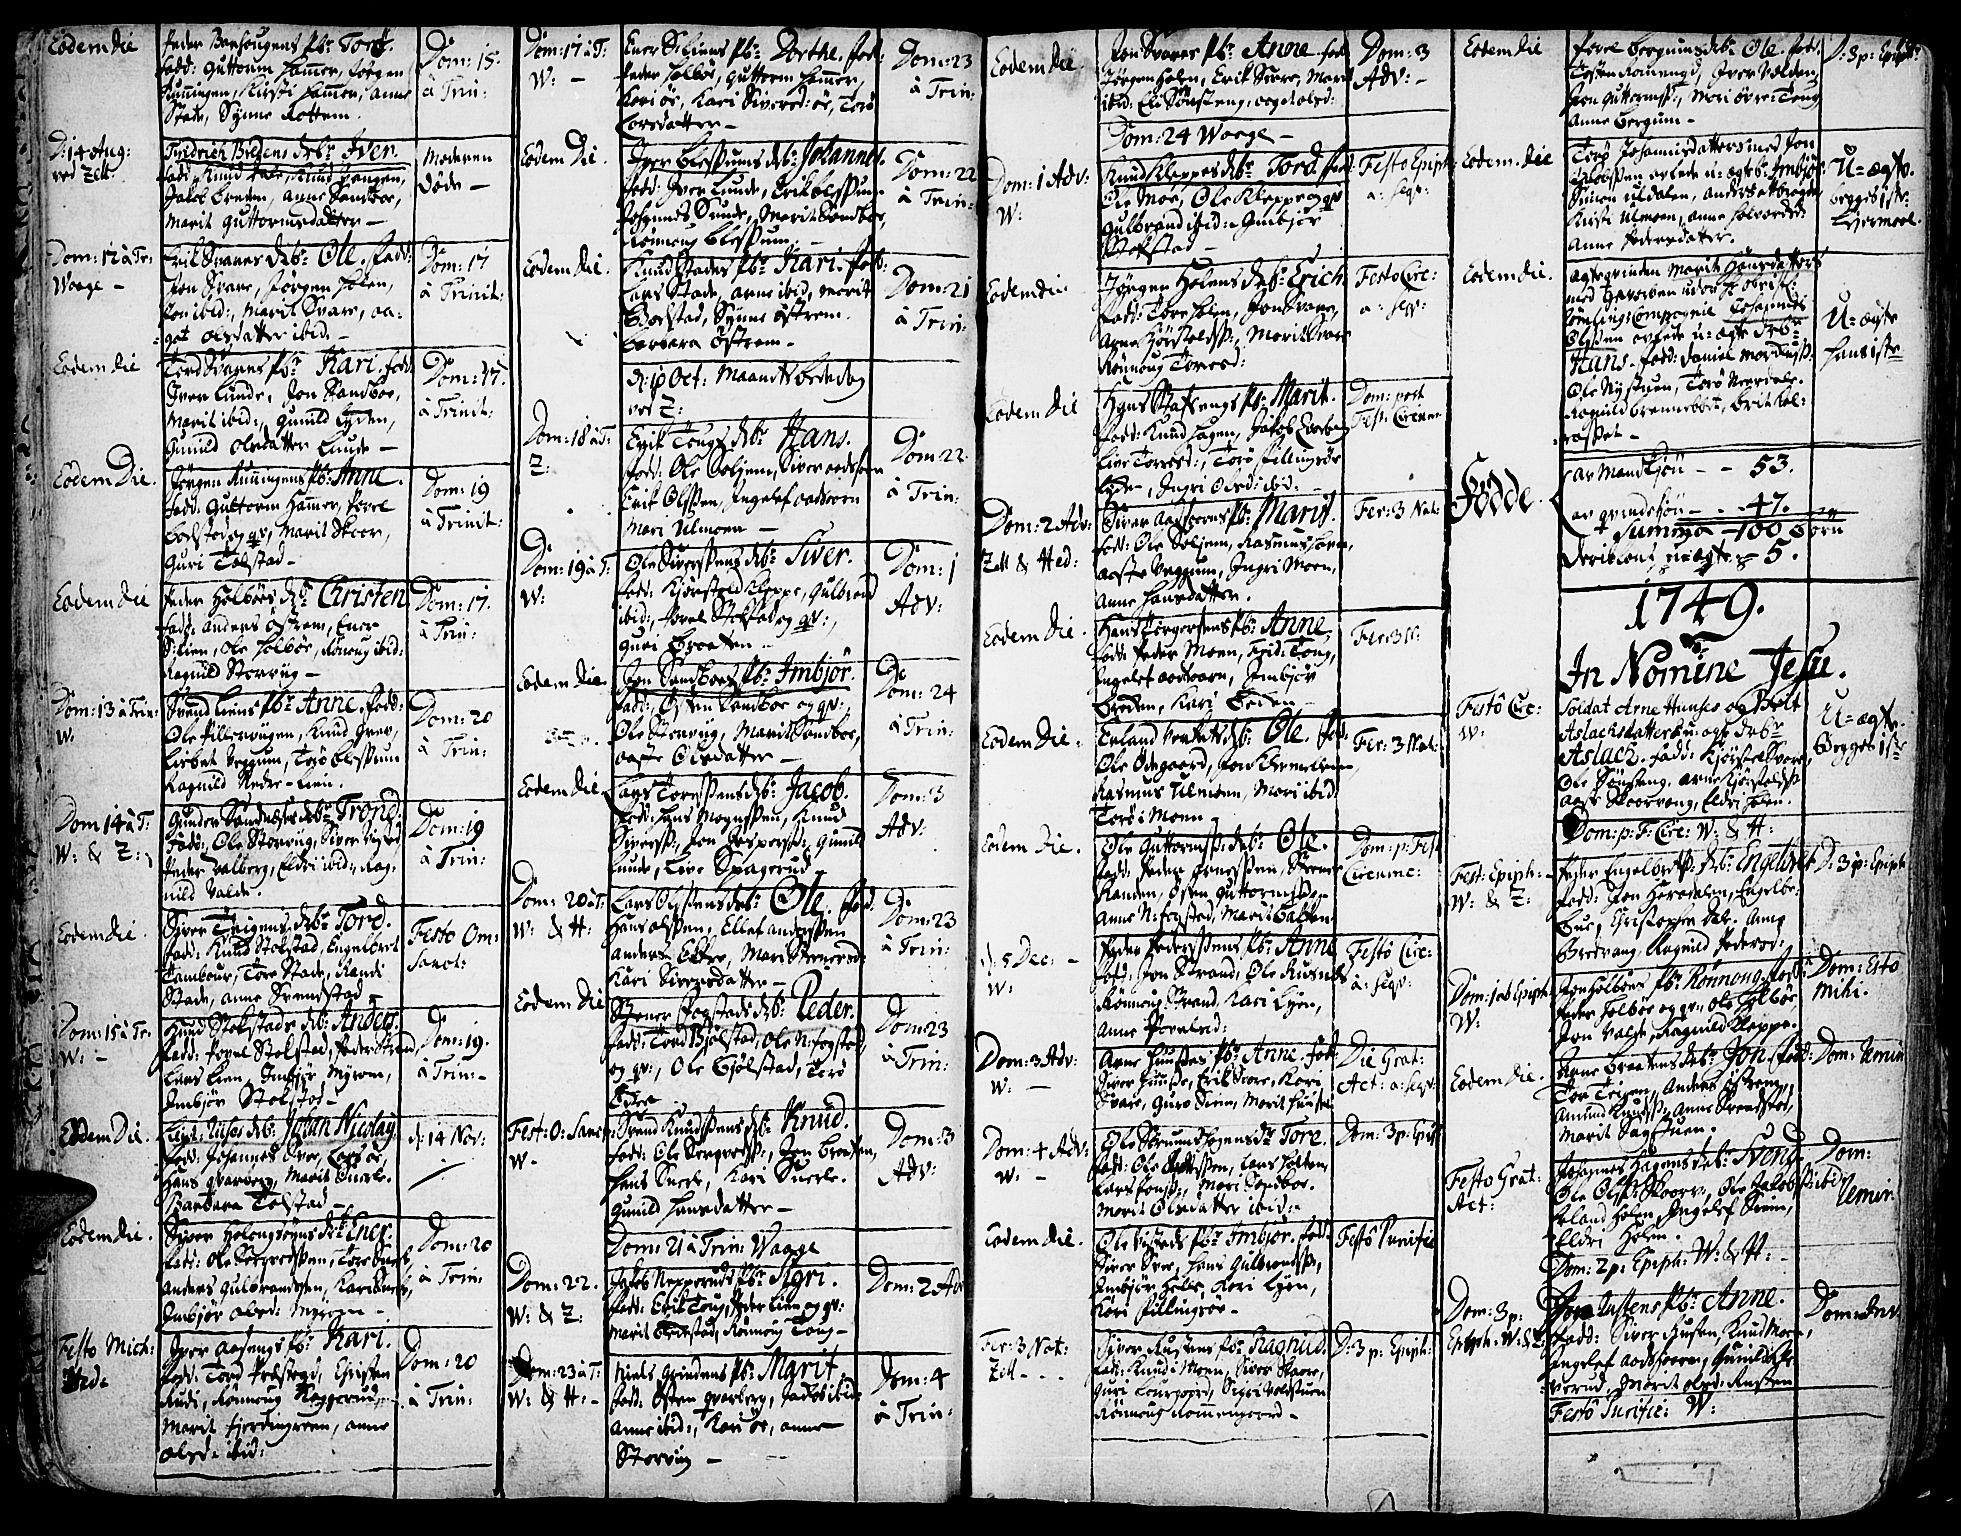 SAH, Vågå prestekontor, Ministerialbok nr. 1, 1739-1810, s. 19